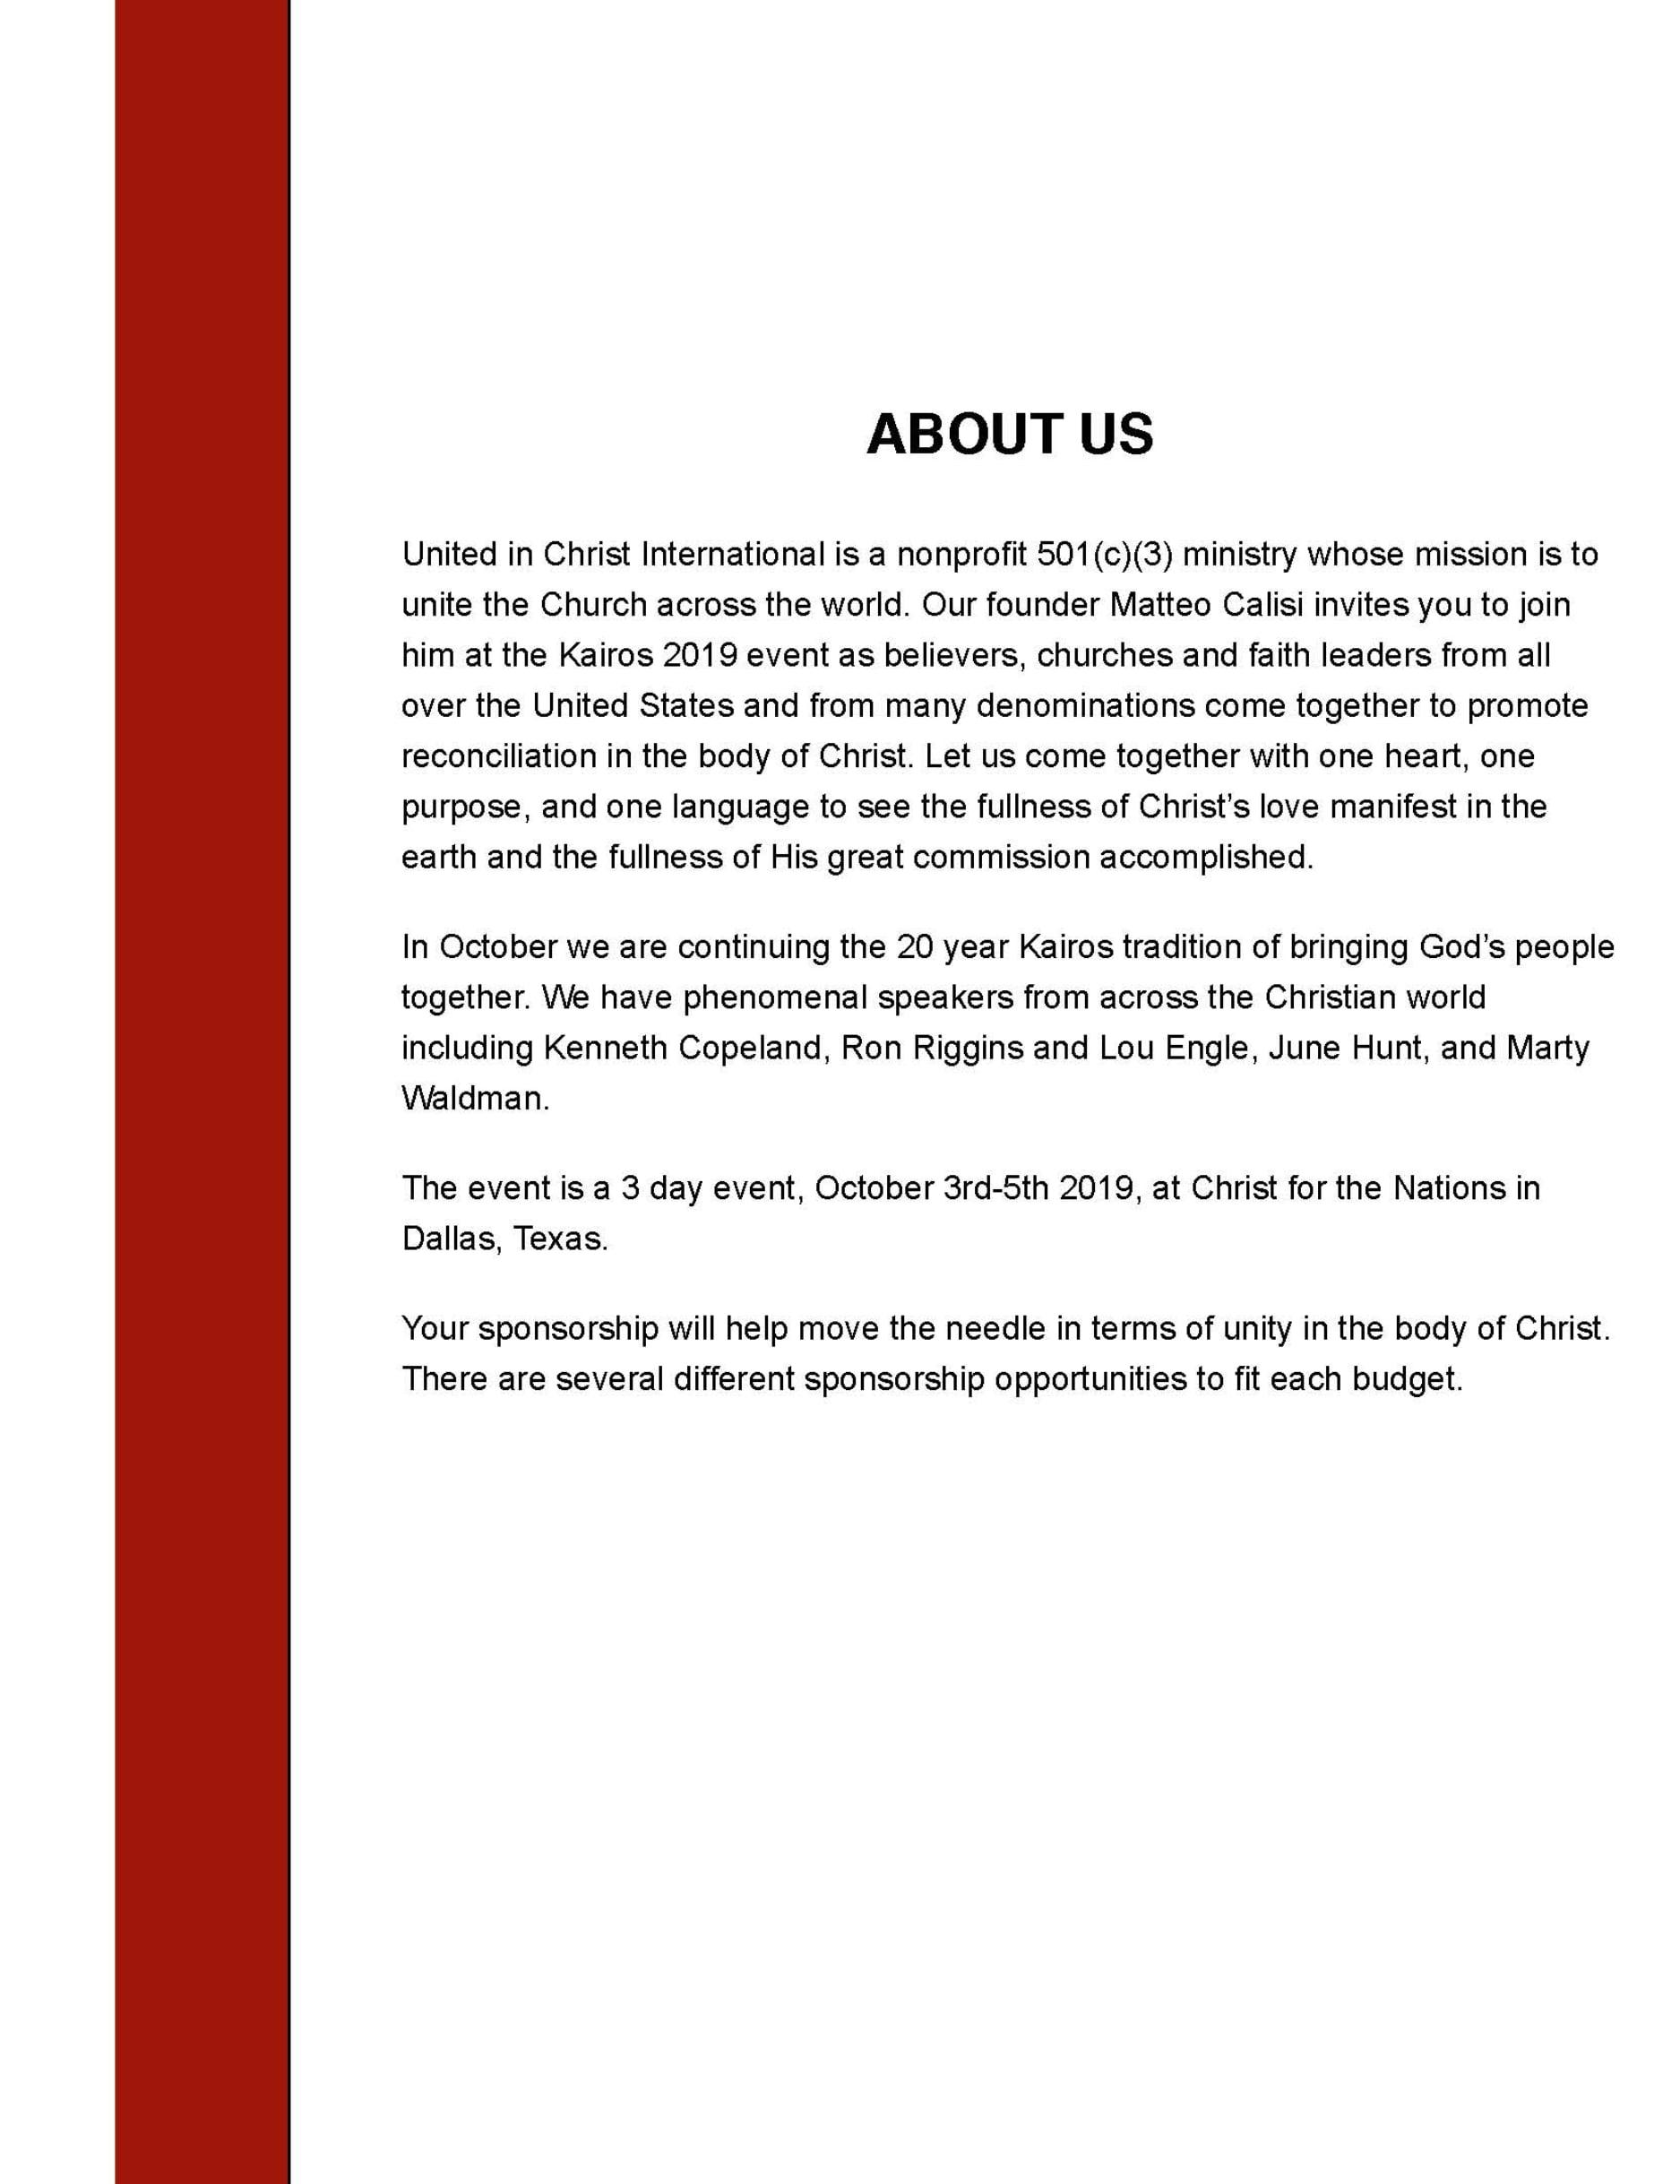 Kairos Sponsorship Letter 2019_Page_3.jpg